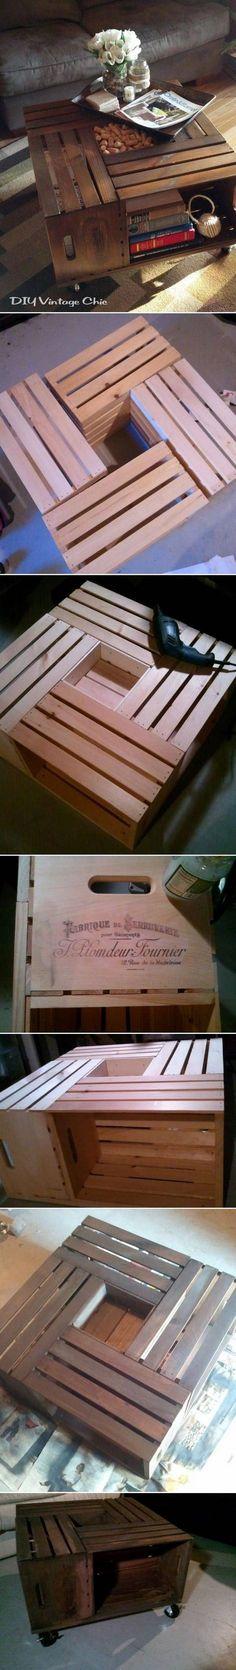 27 DIY Wine Crate Coffee Table